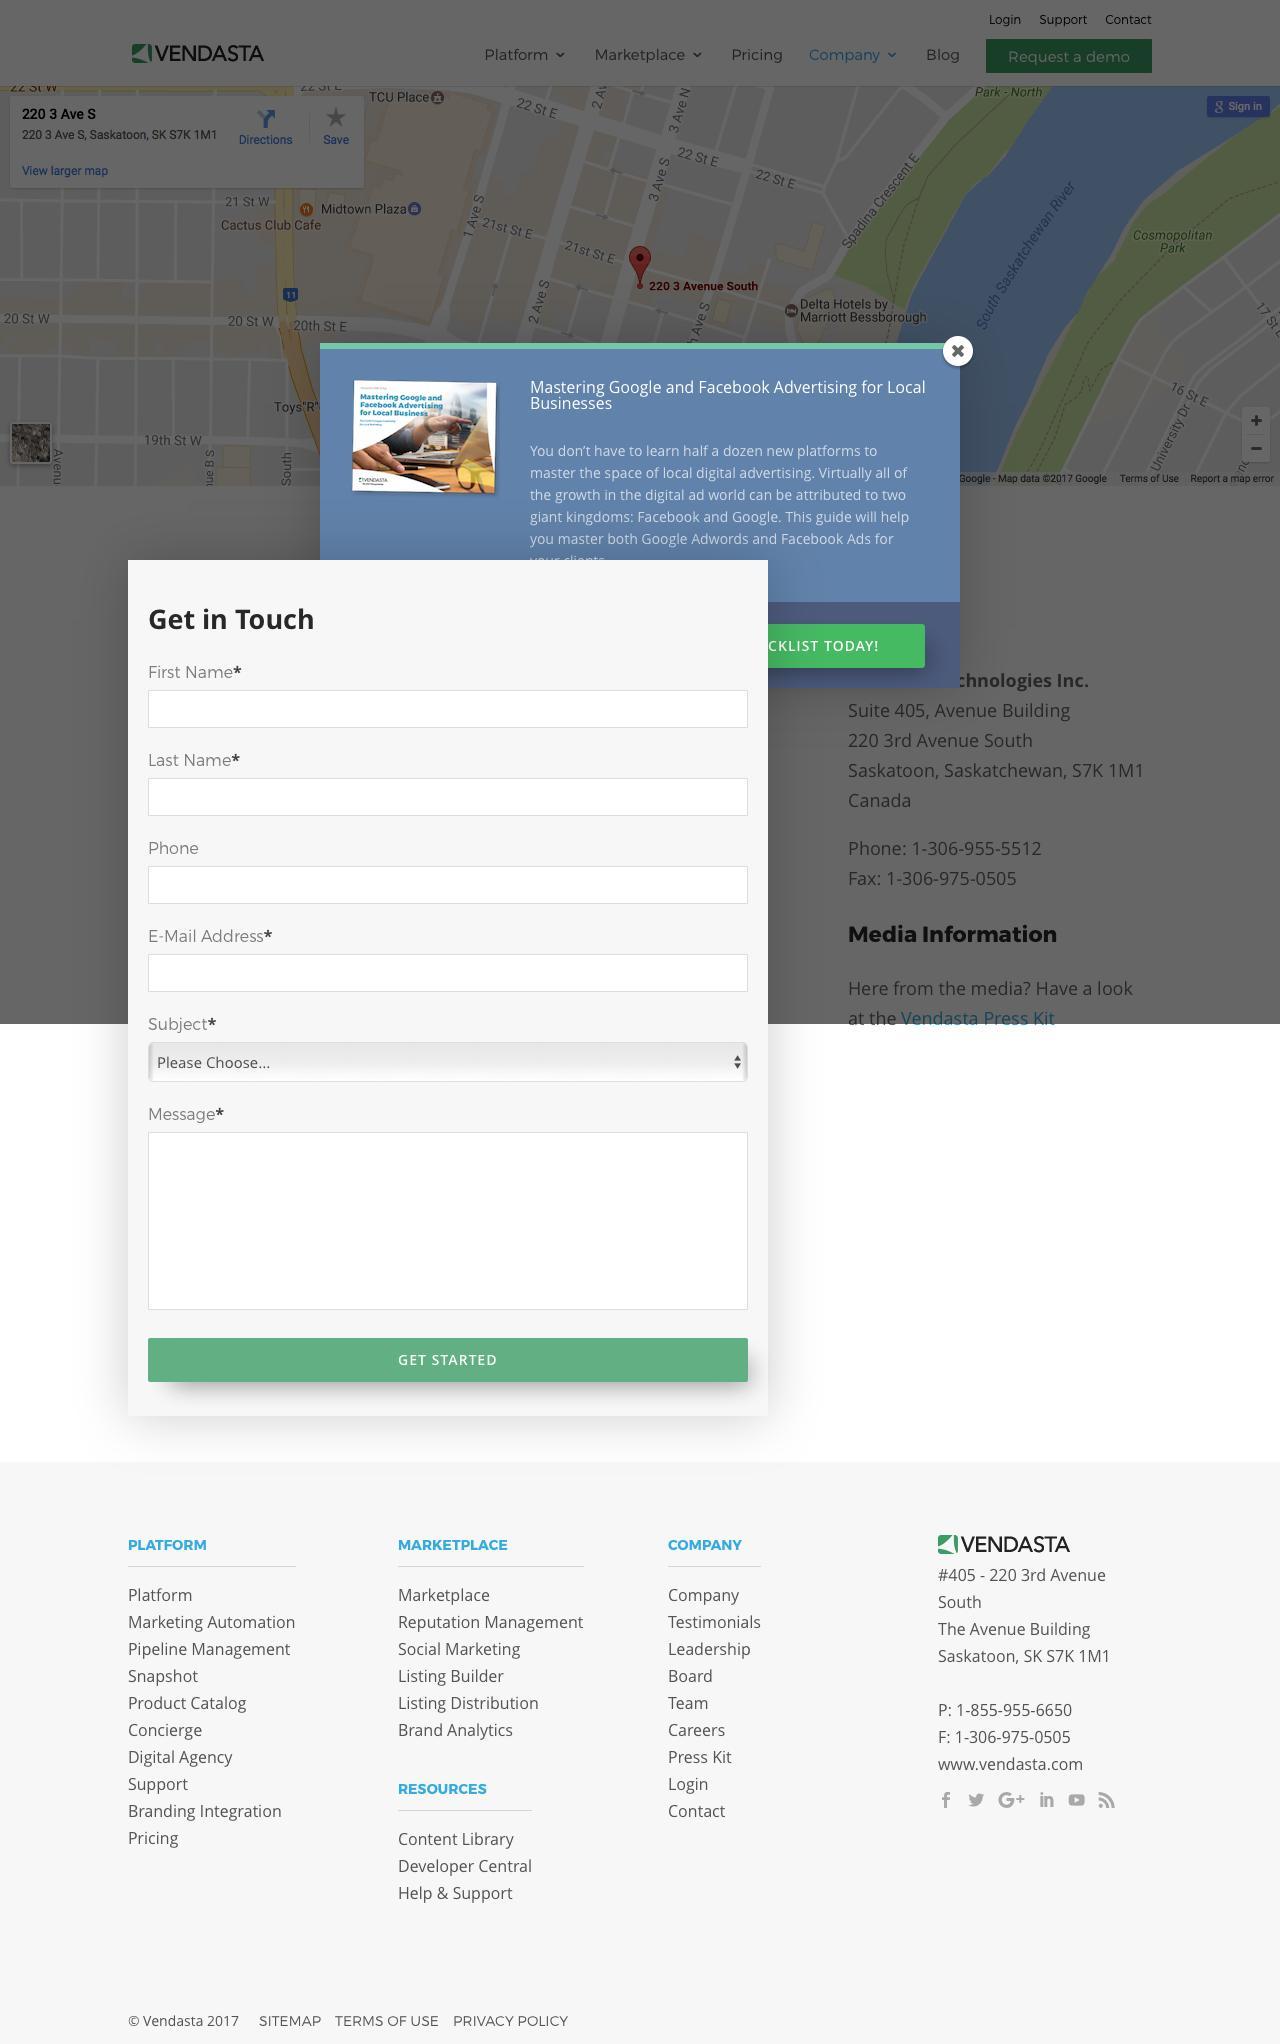 Screenshot of vendasta.com - Contact Us | Vendasta - captured Feb. 25, 2017